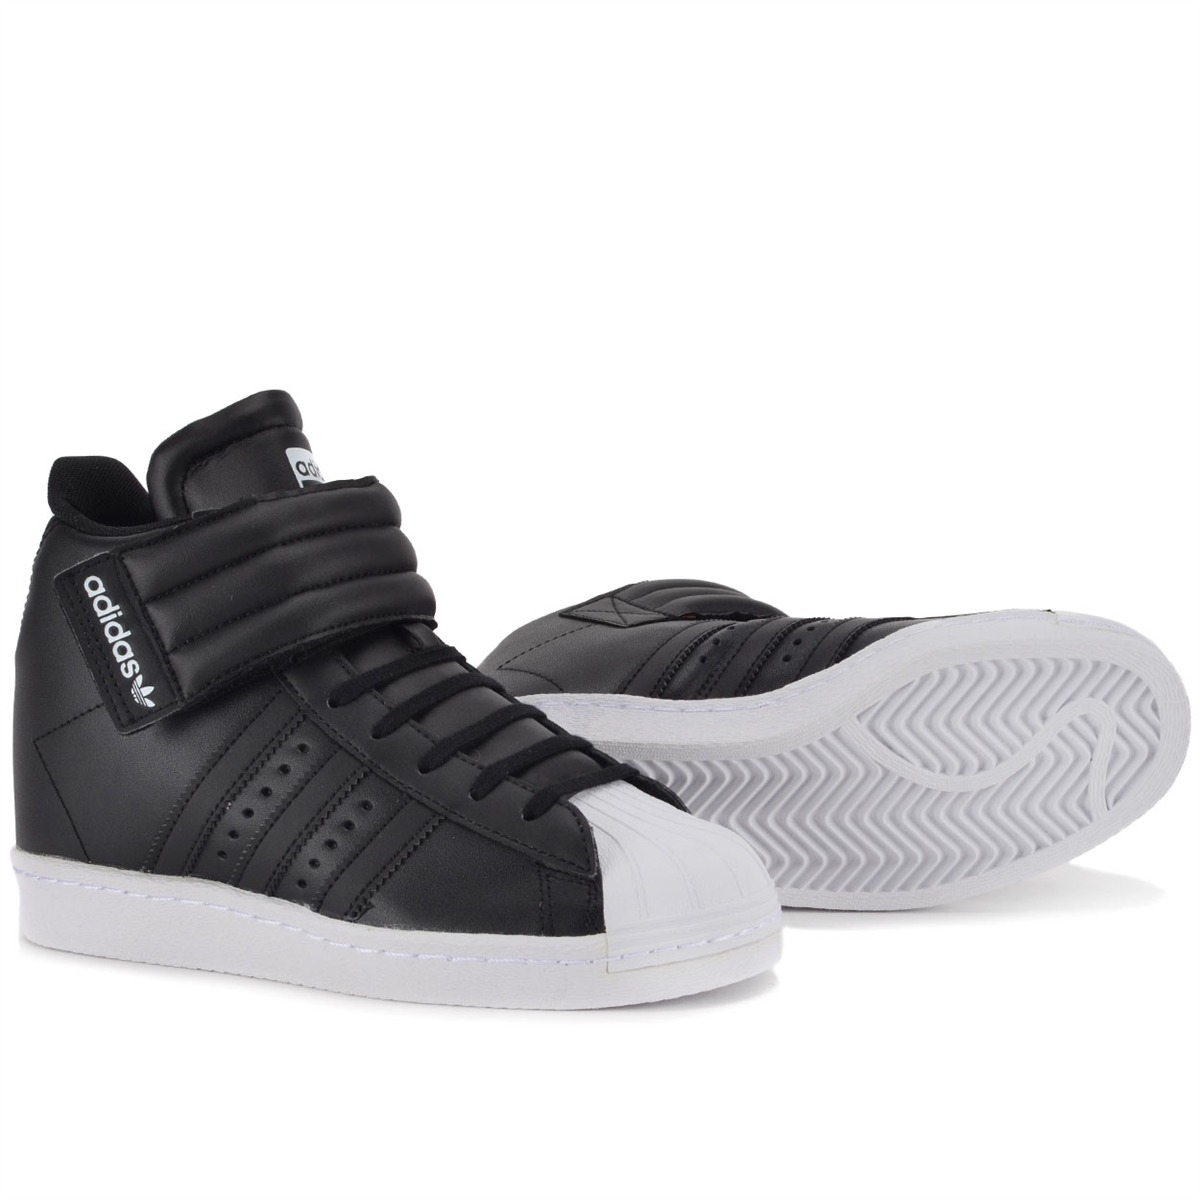 Adidas Superstar Up Strap verde